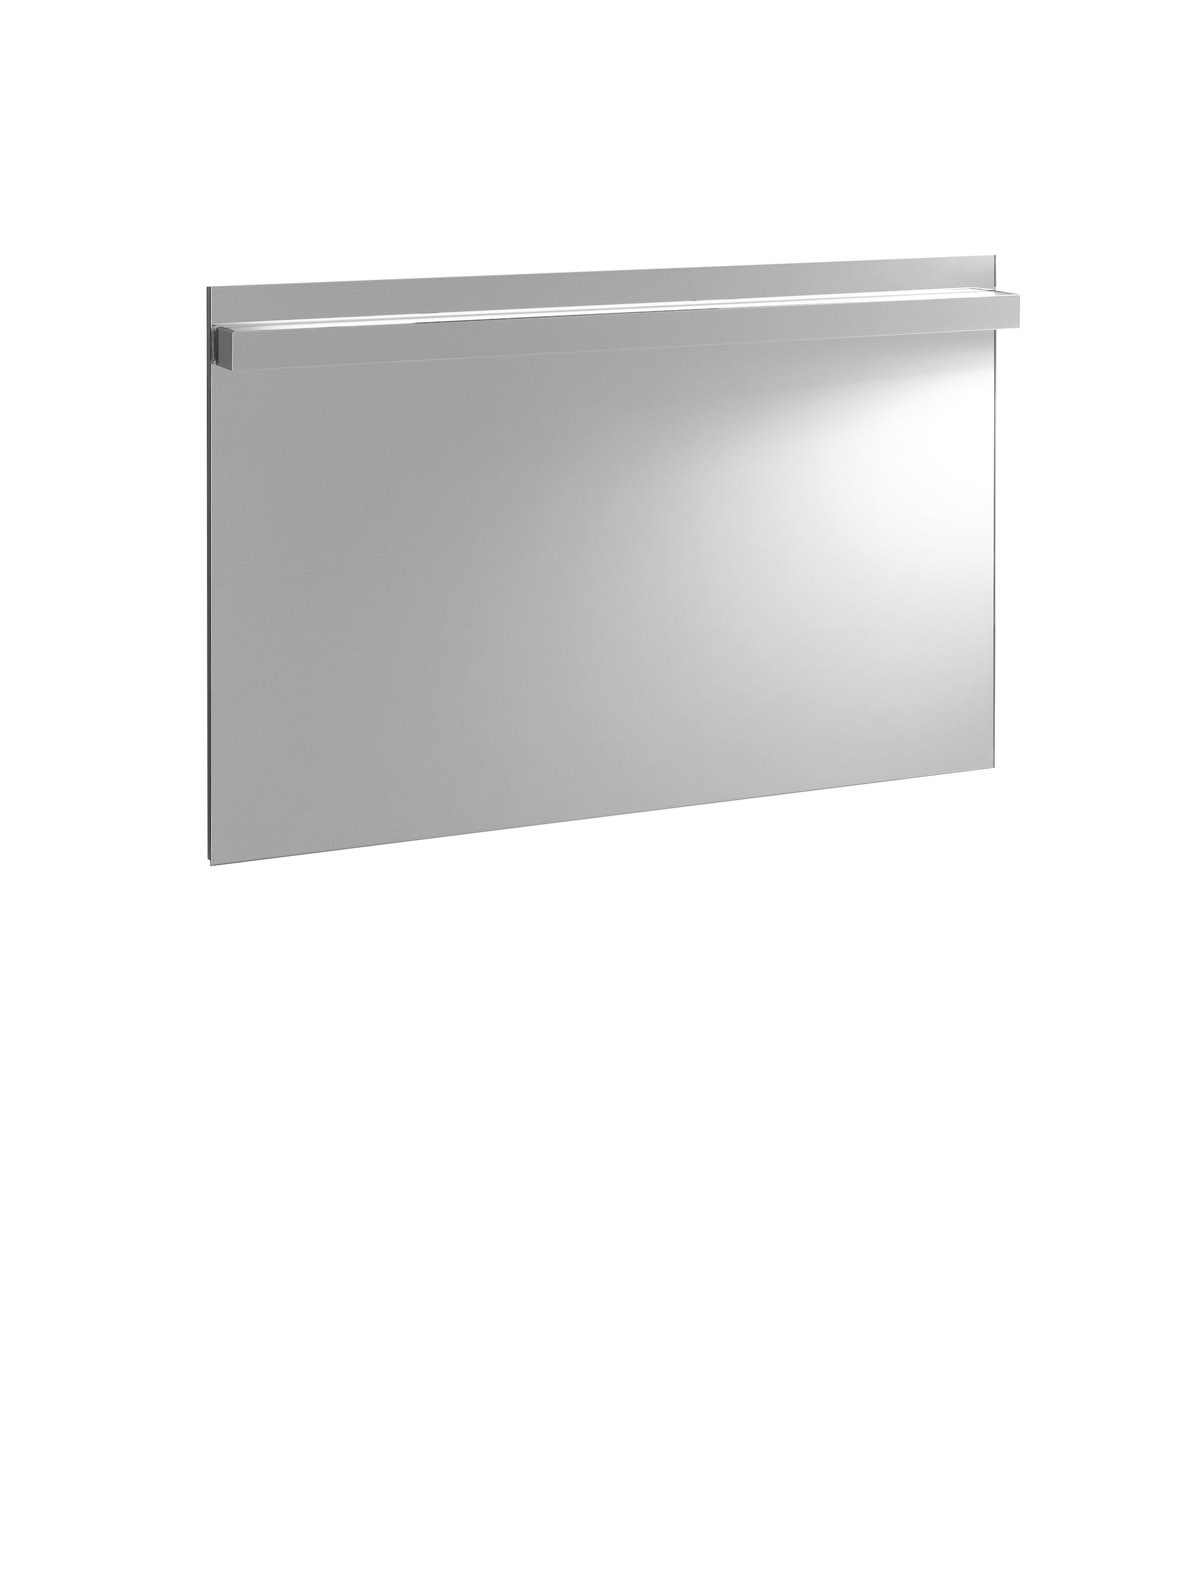 zrcadlo KERAMAG Icon zrcadlo s osvětlením 120x75 cm